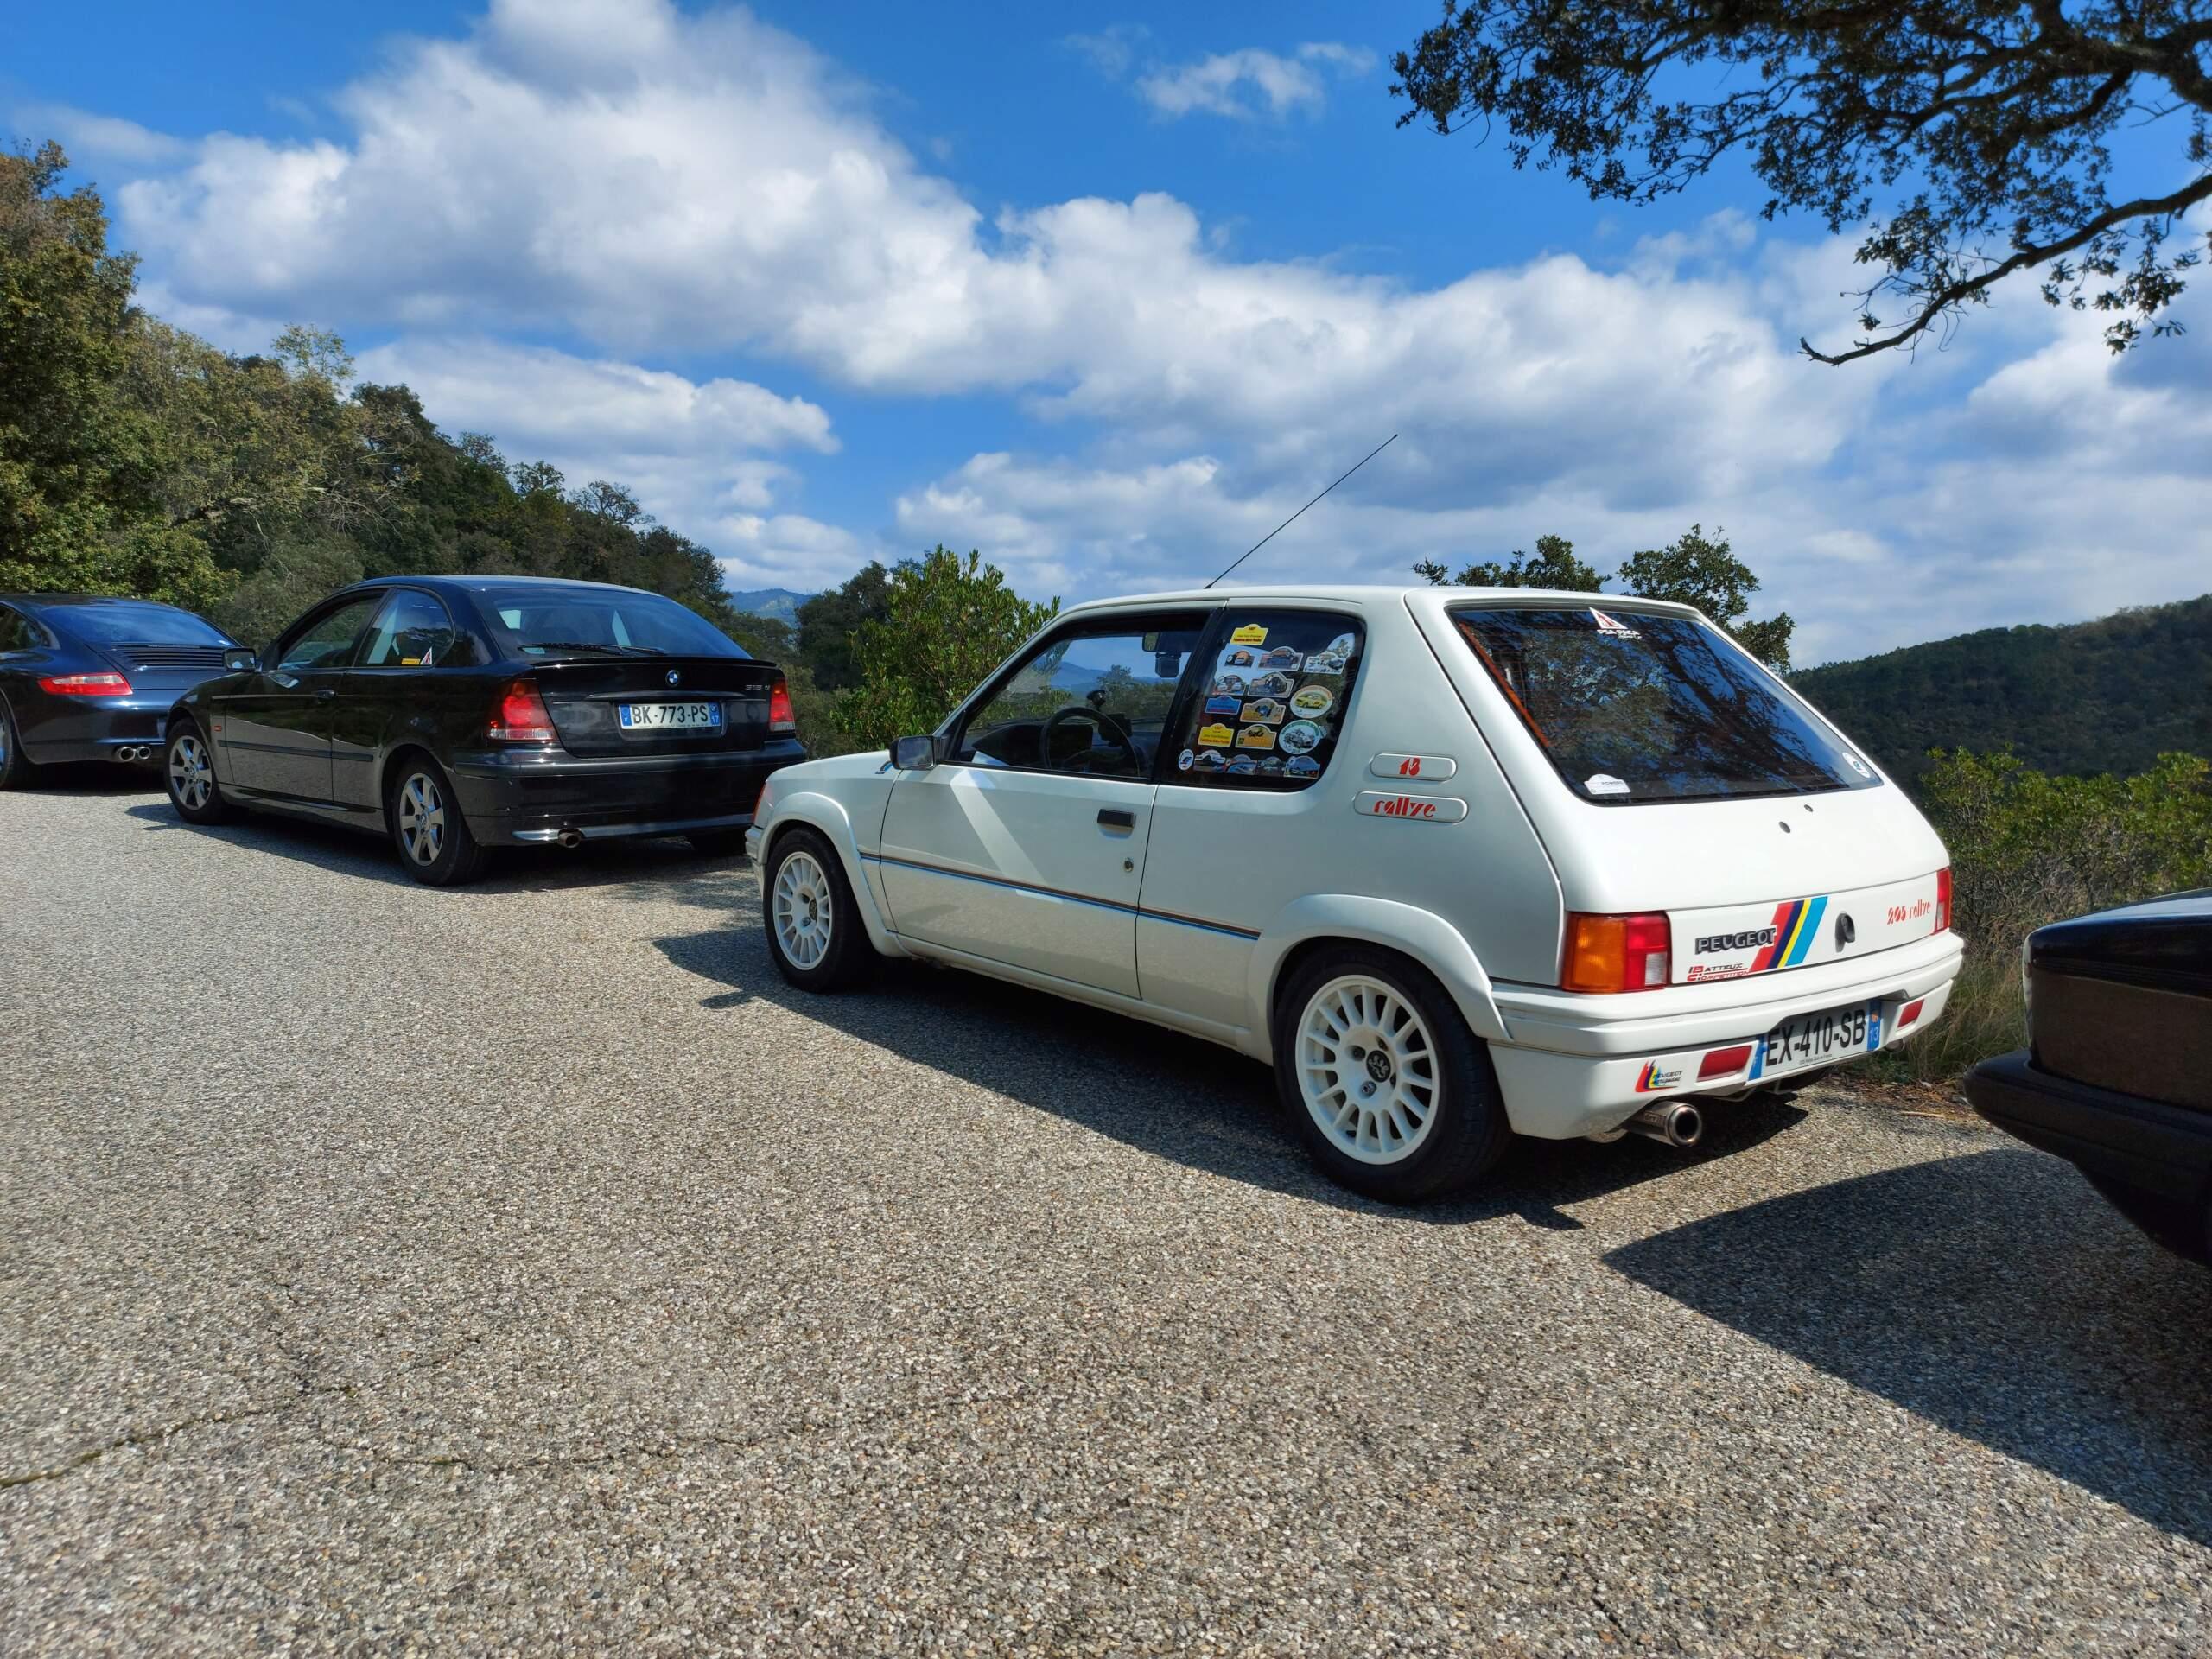 [jean-luc13] 205 Rallye Blanc Meije 1989 - Page 29 20210321